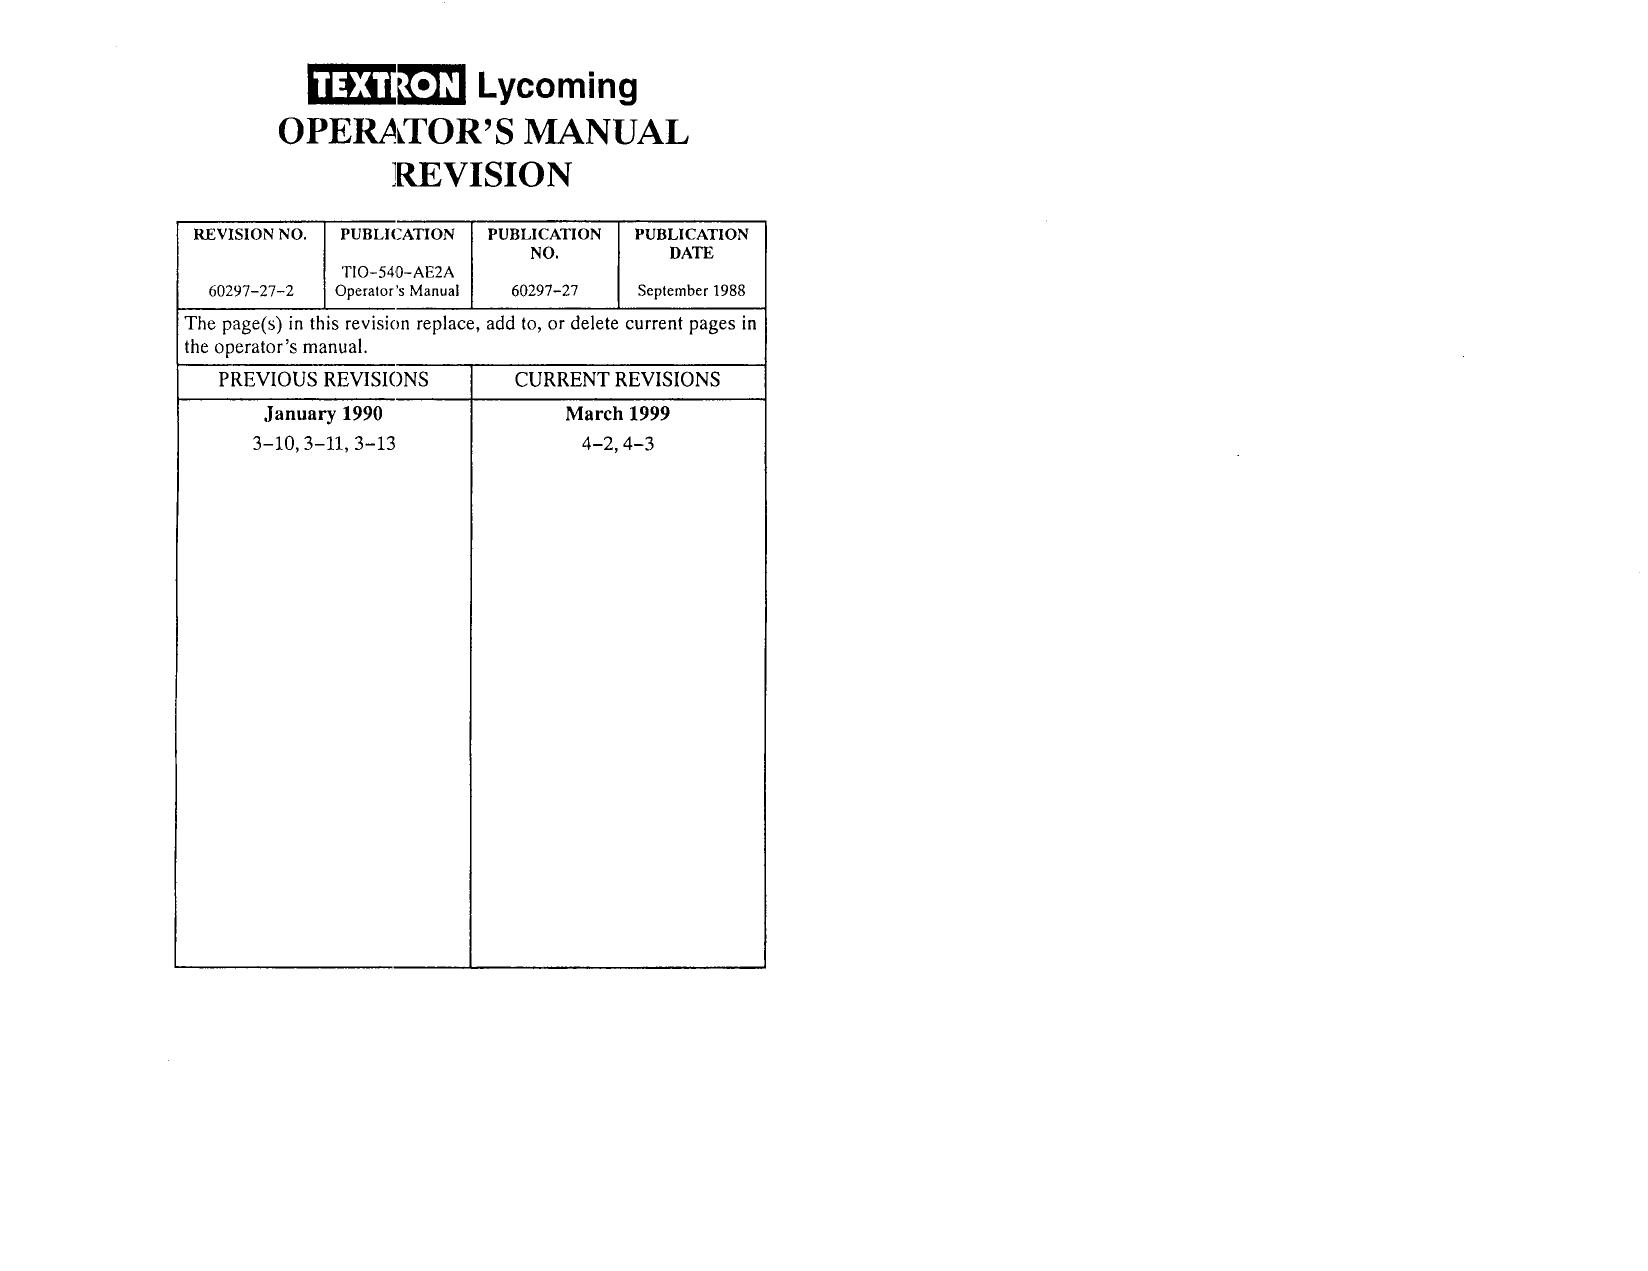 TEXTRON Lycoming Operator`s Manual 60297-27 | manualzz com